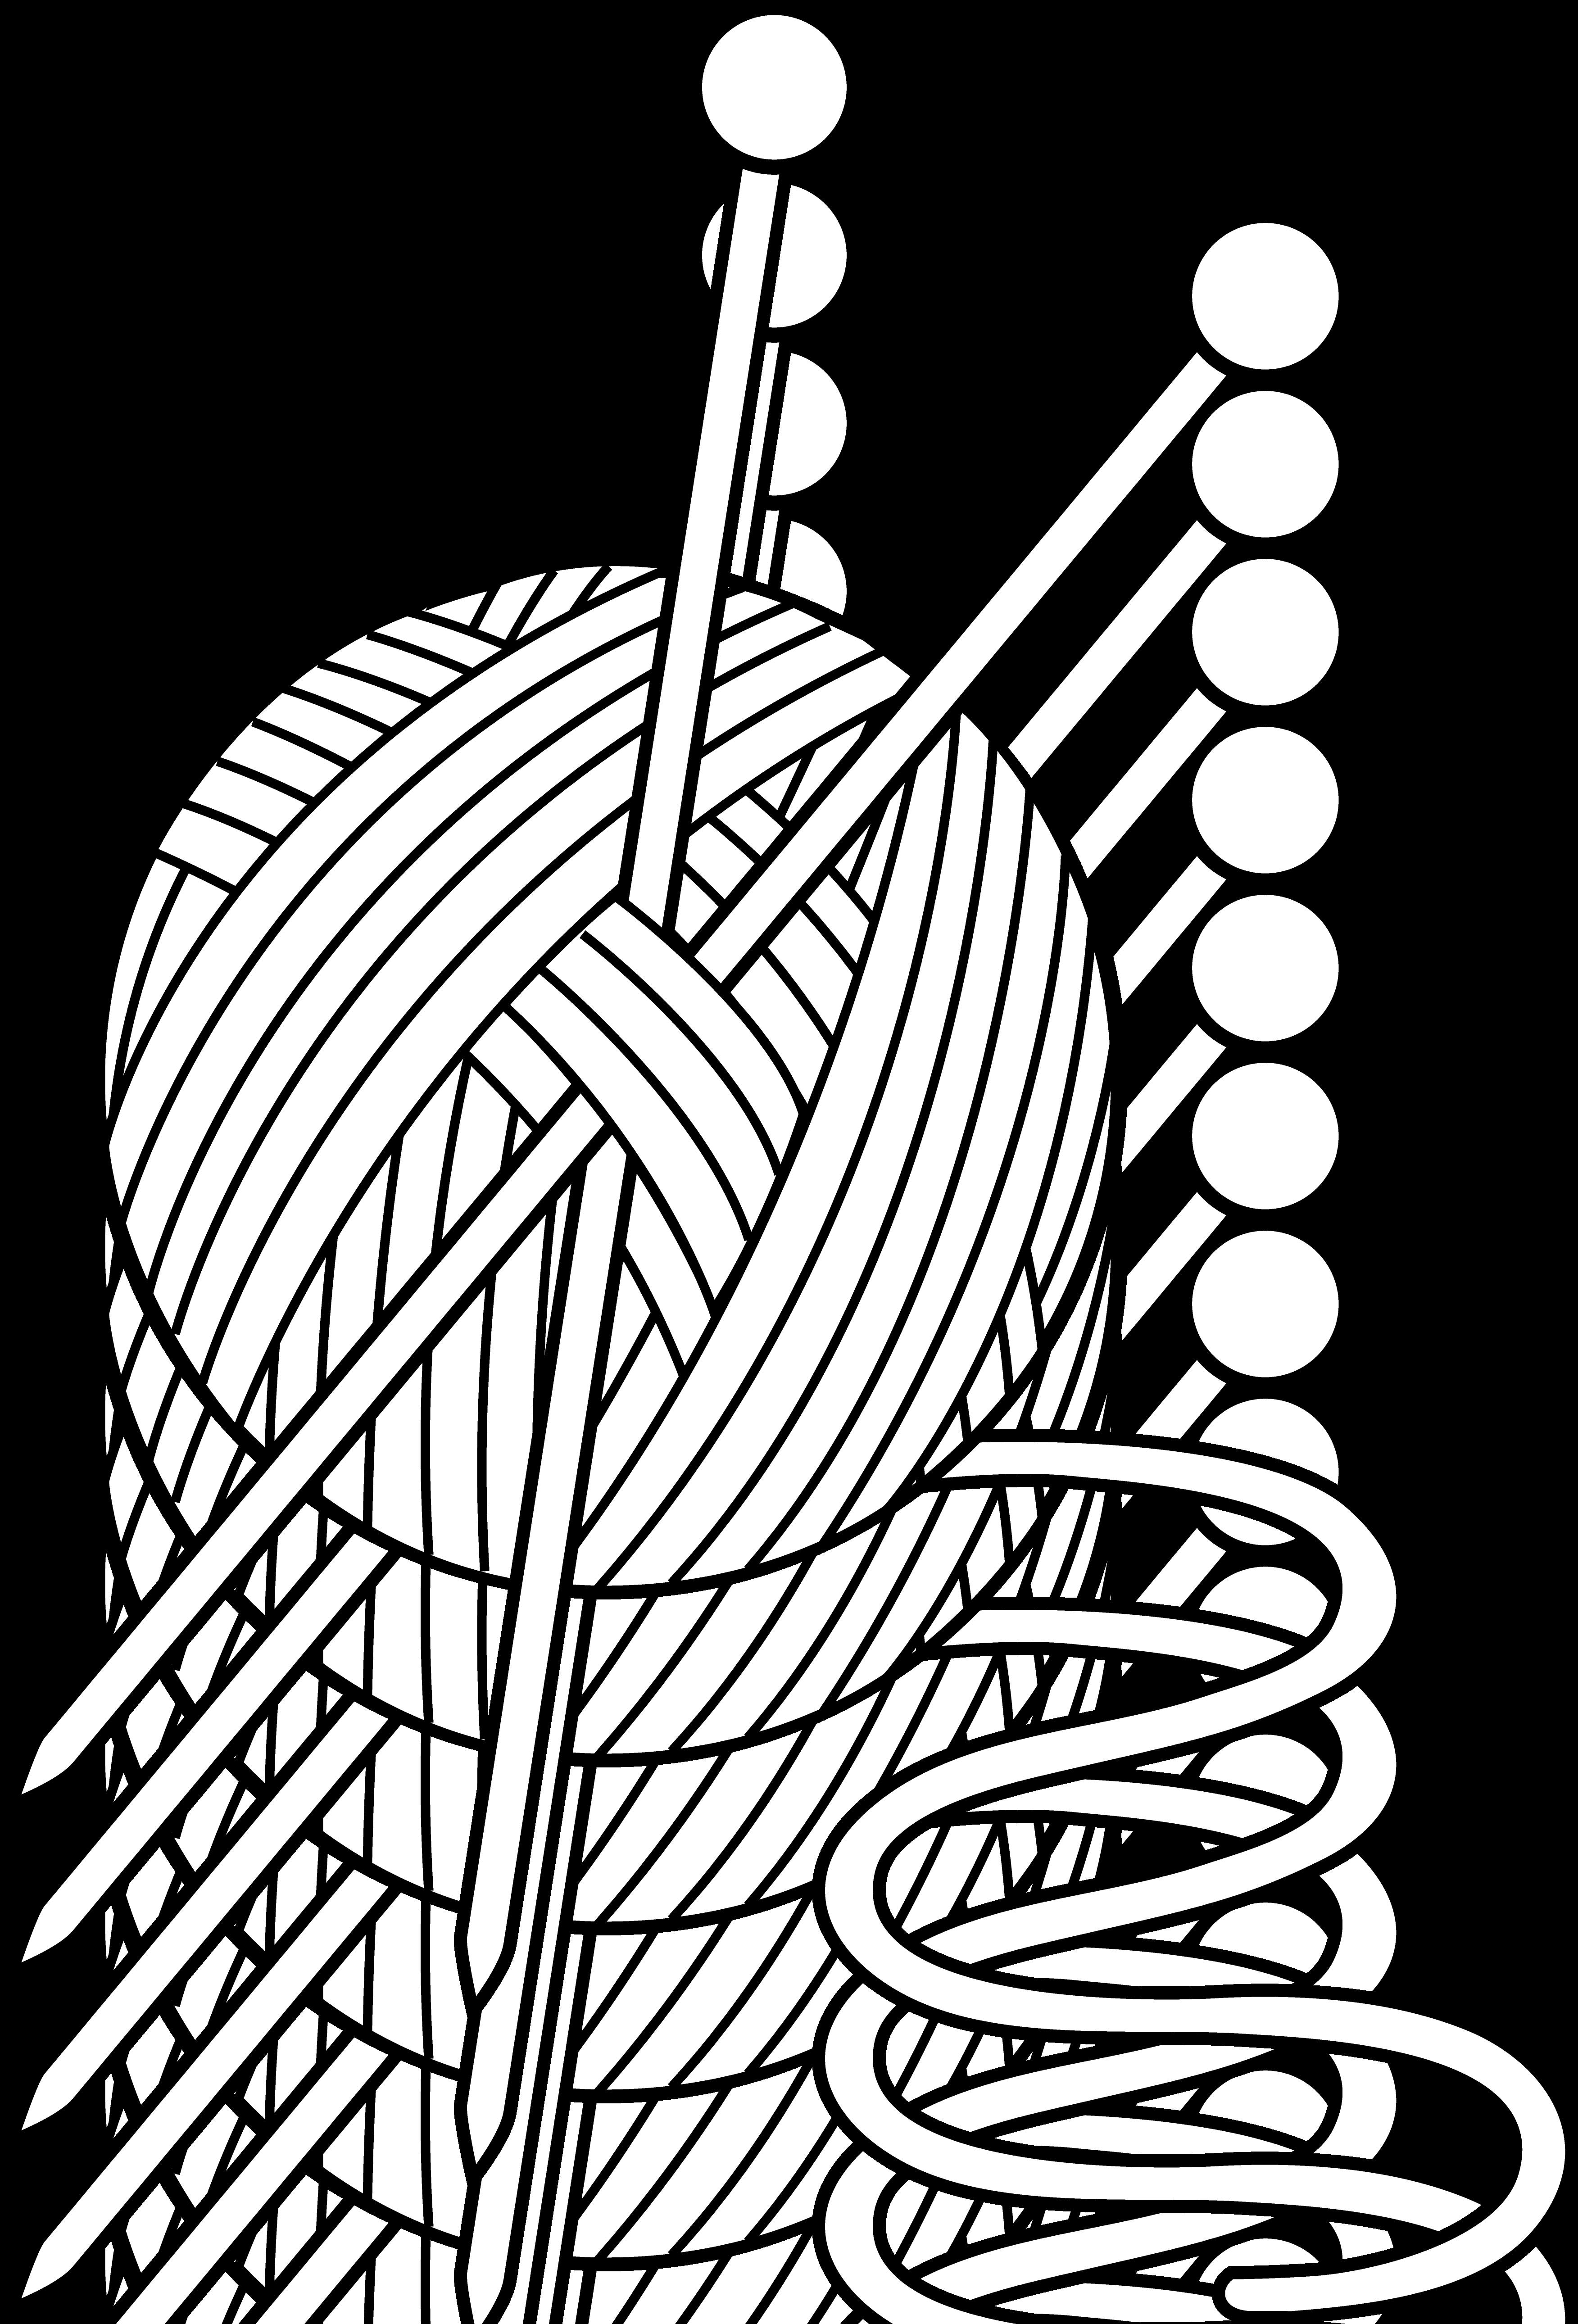 Black and White Knitting Set Free Clip Art Free clip